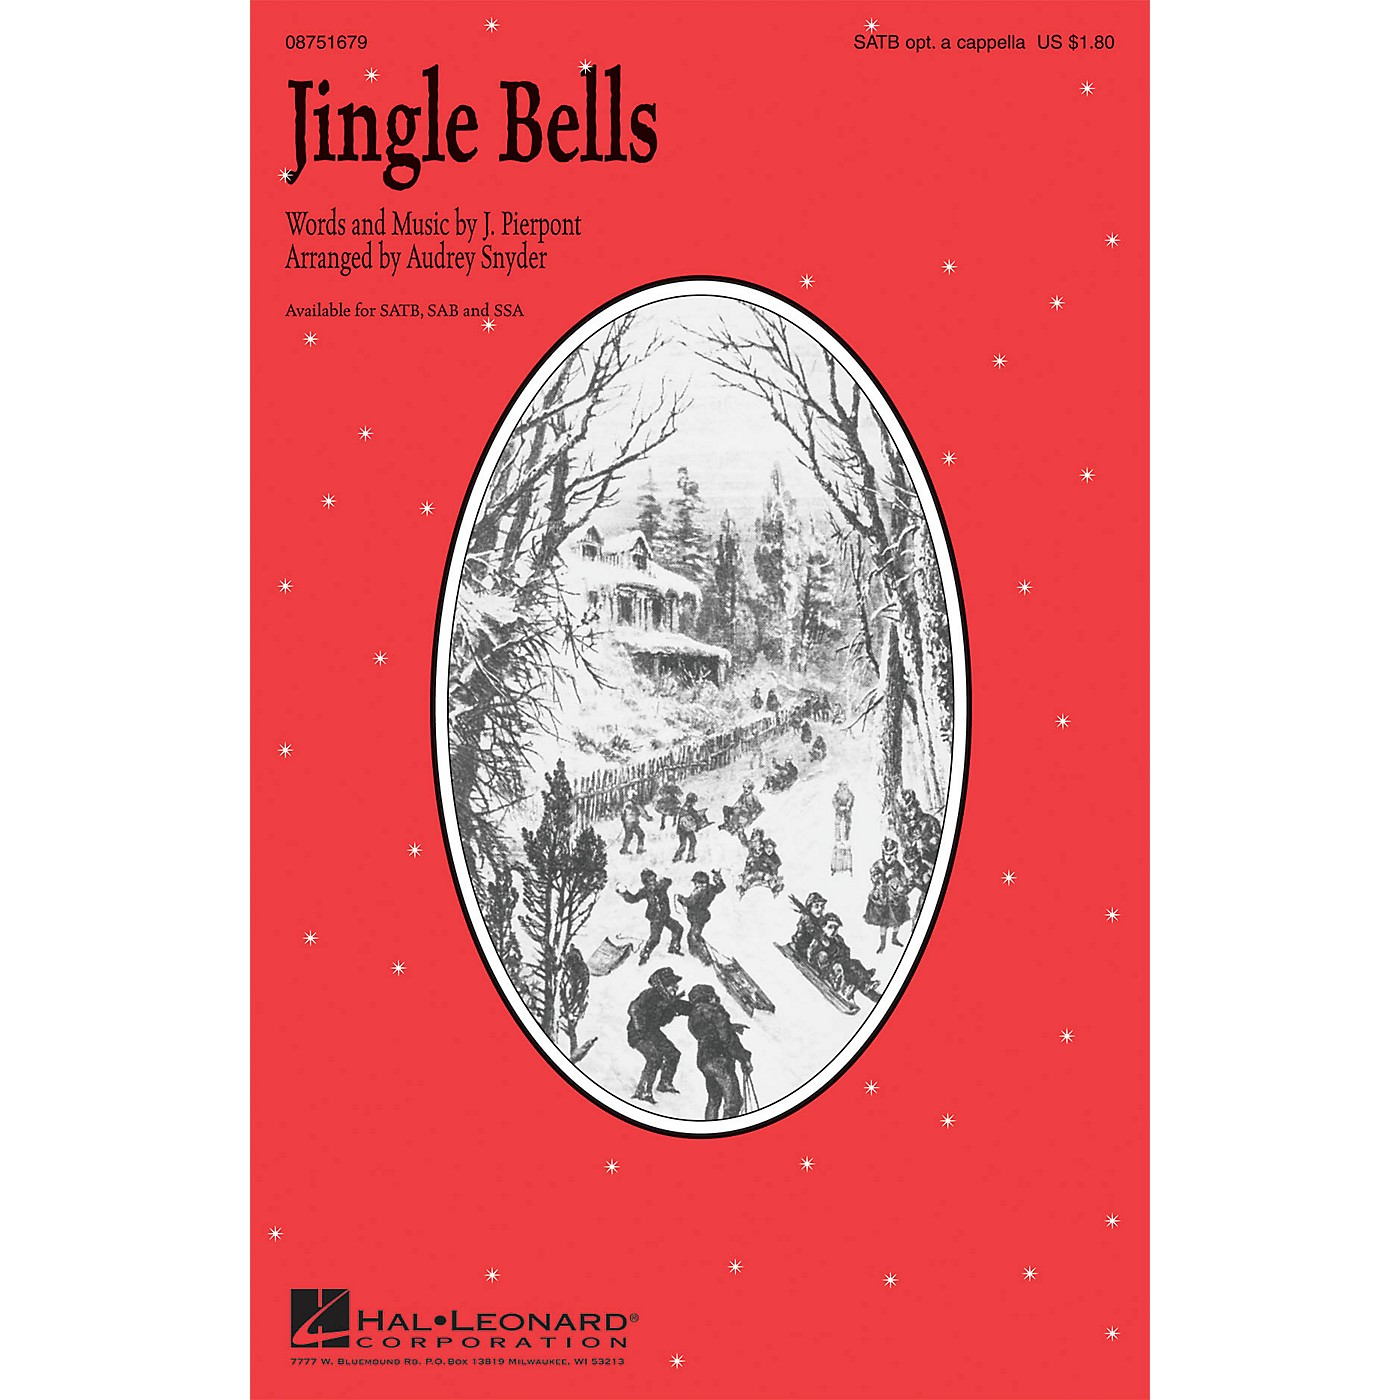 Hal Leonard Jingle Bells SAB optional a cappella Arranged by Audrey Snyder thumbnail